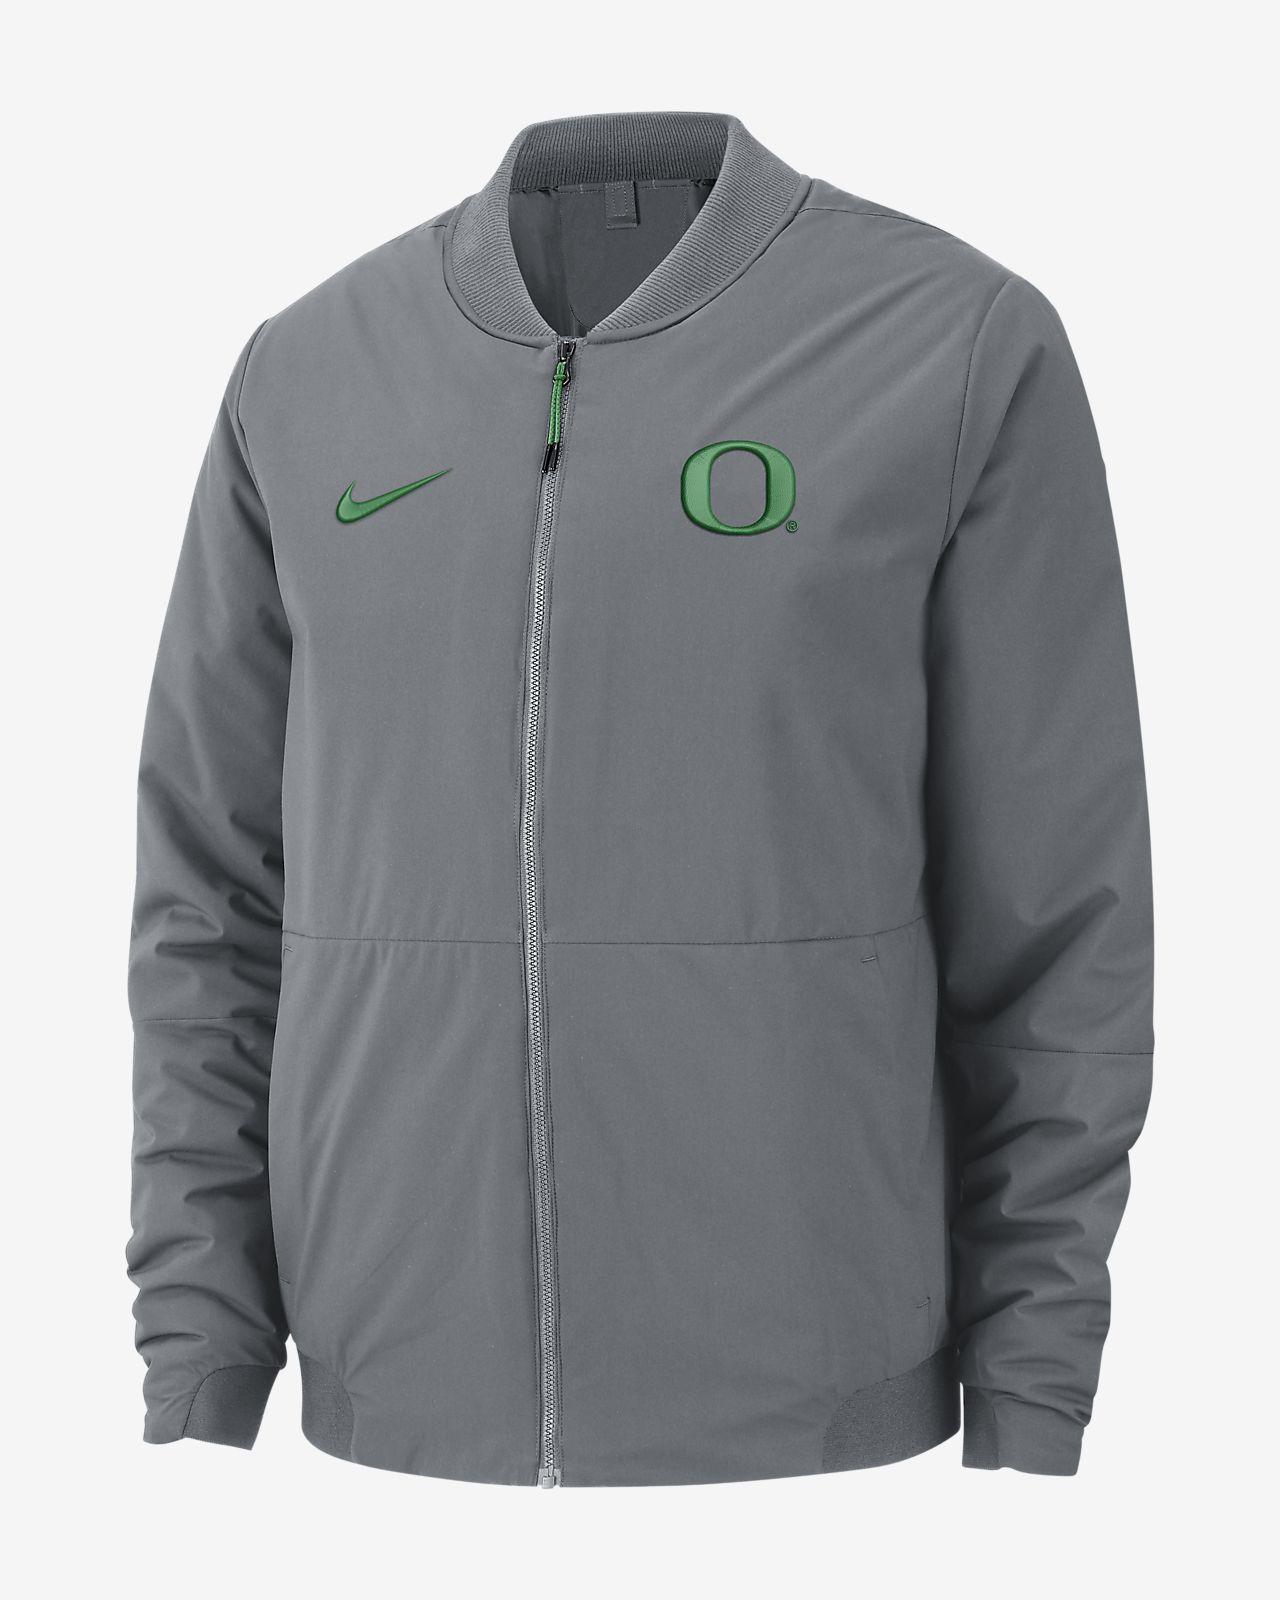 Nike College Shield (Oregon) Men's Bomber Jacket